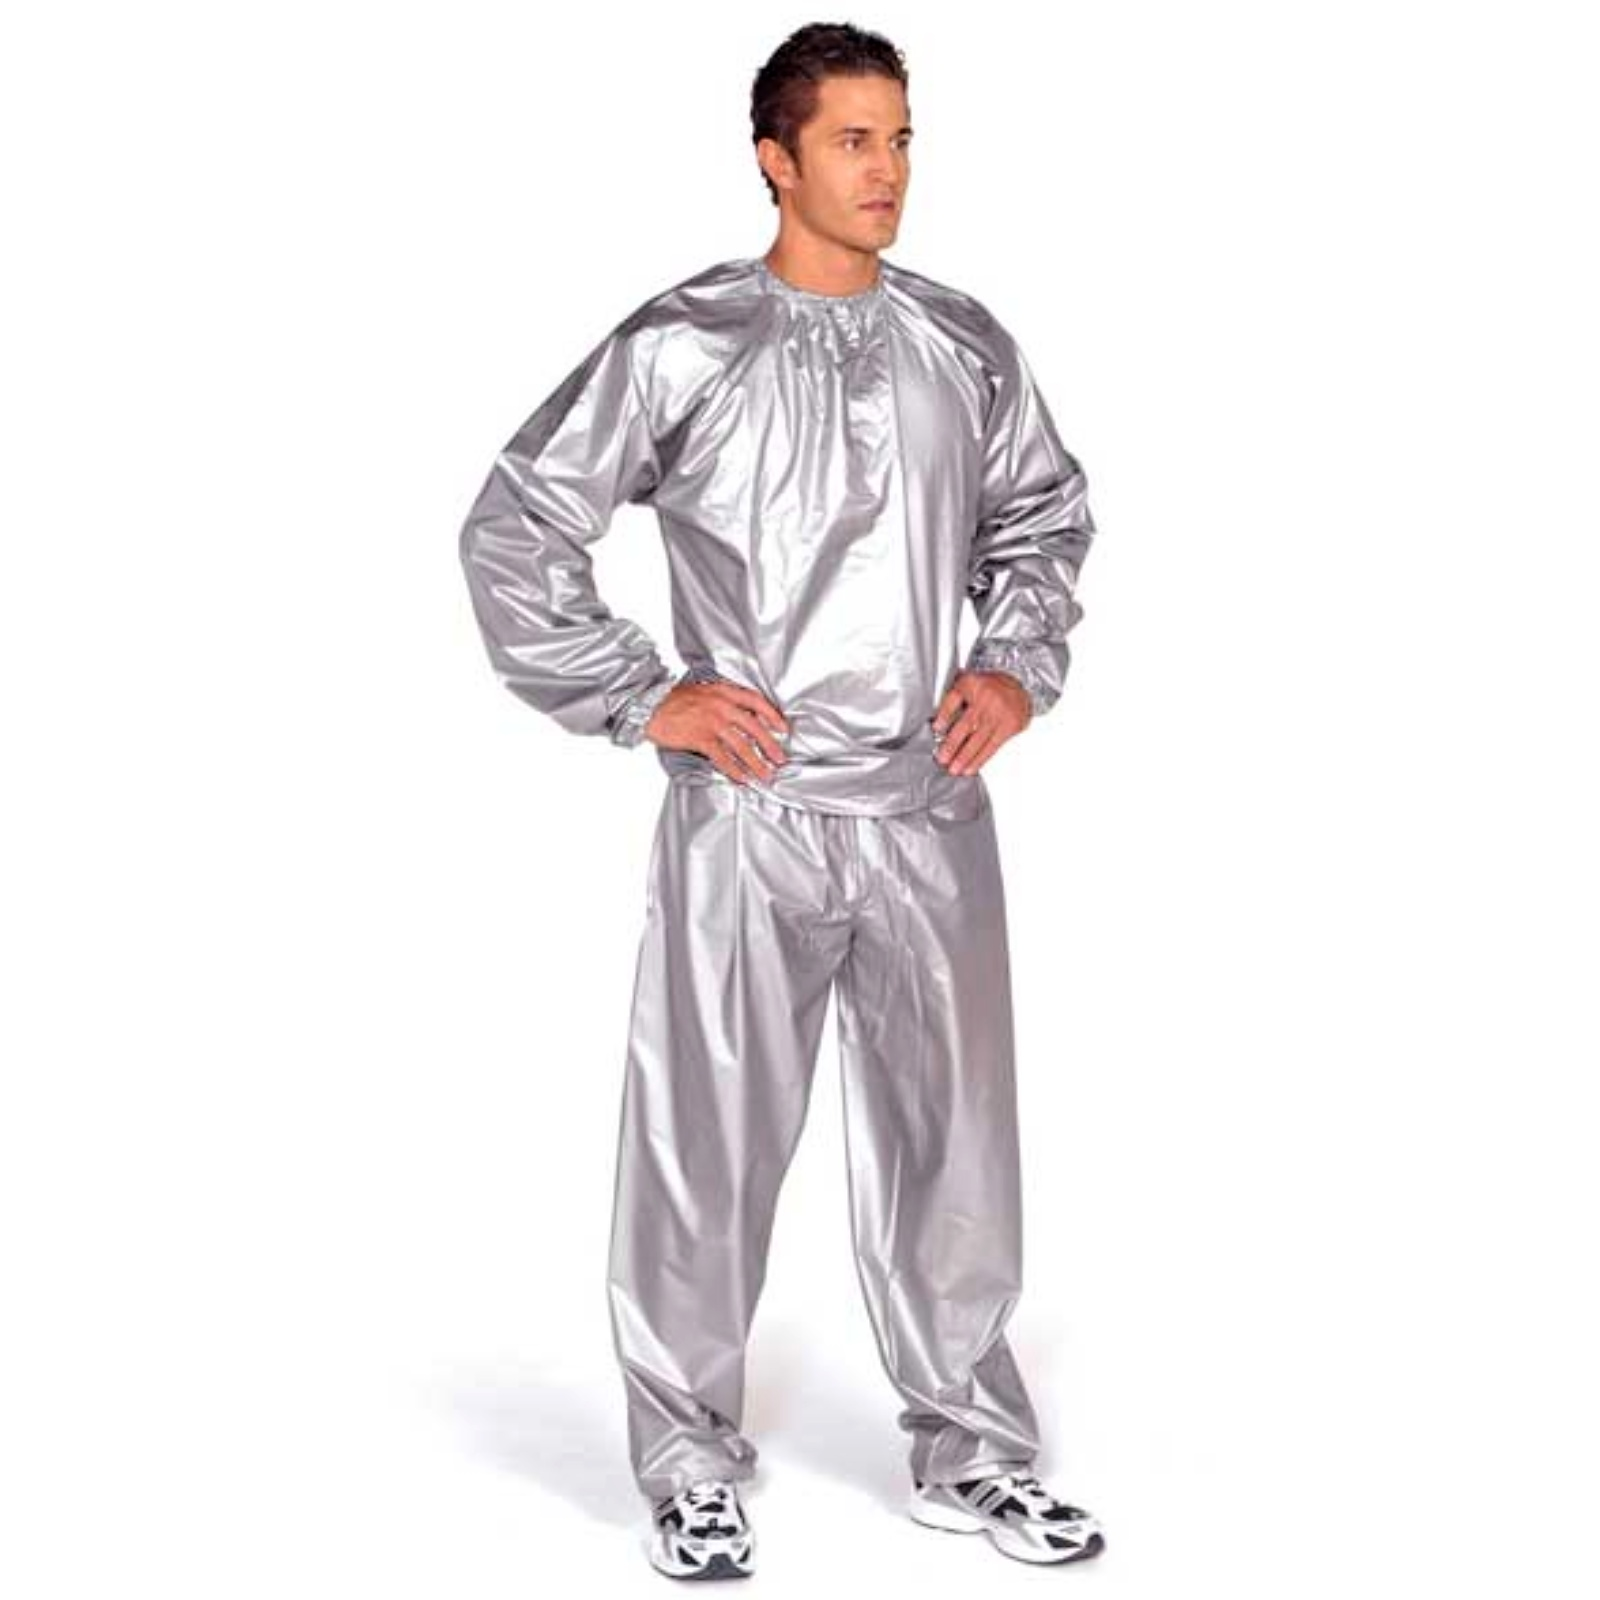 Sauna oblek EVERLAST PVC stříbrný - vel. L/XL